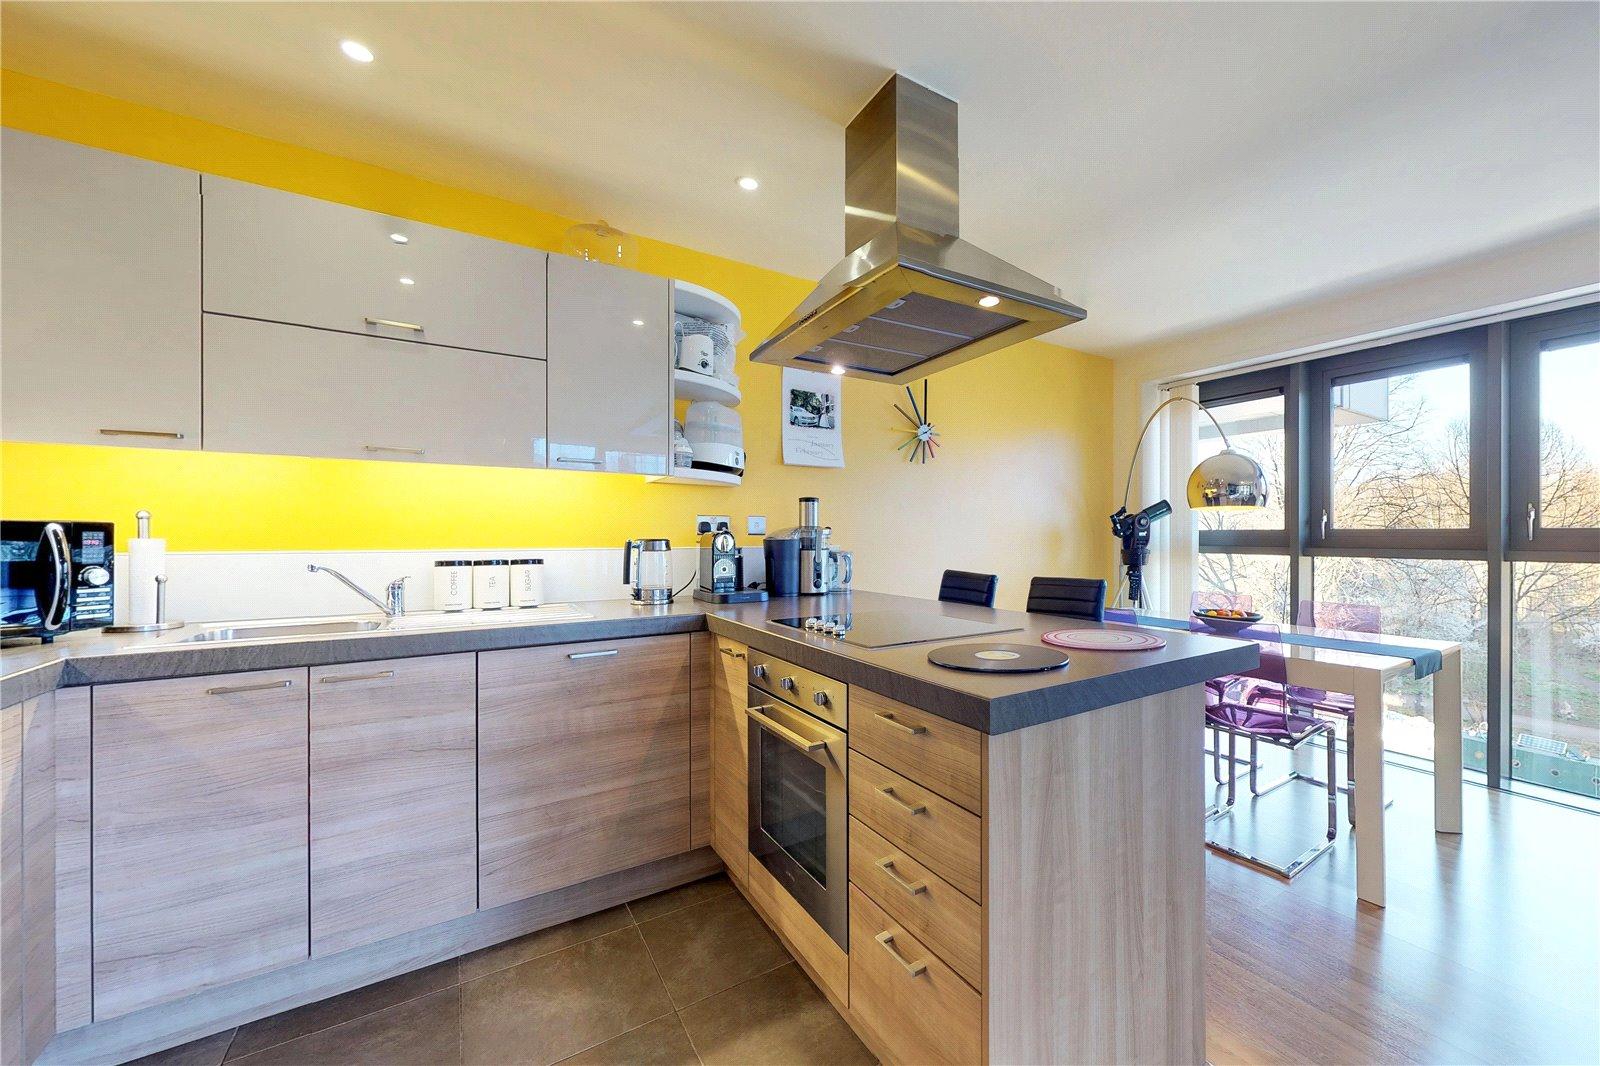 2 Bedroom Property For Sale In Riverwalk Apartments Homerton Road